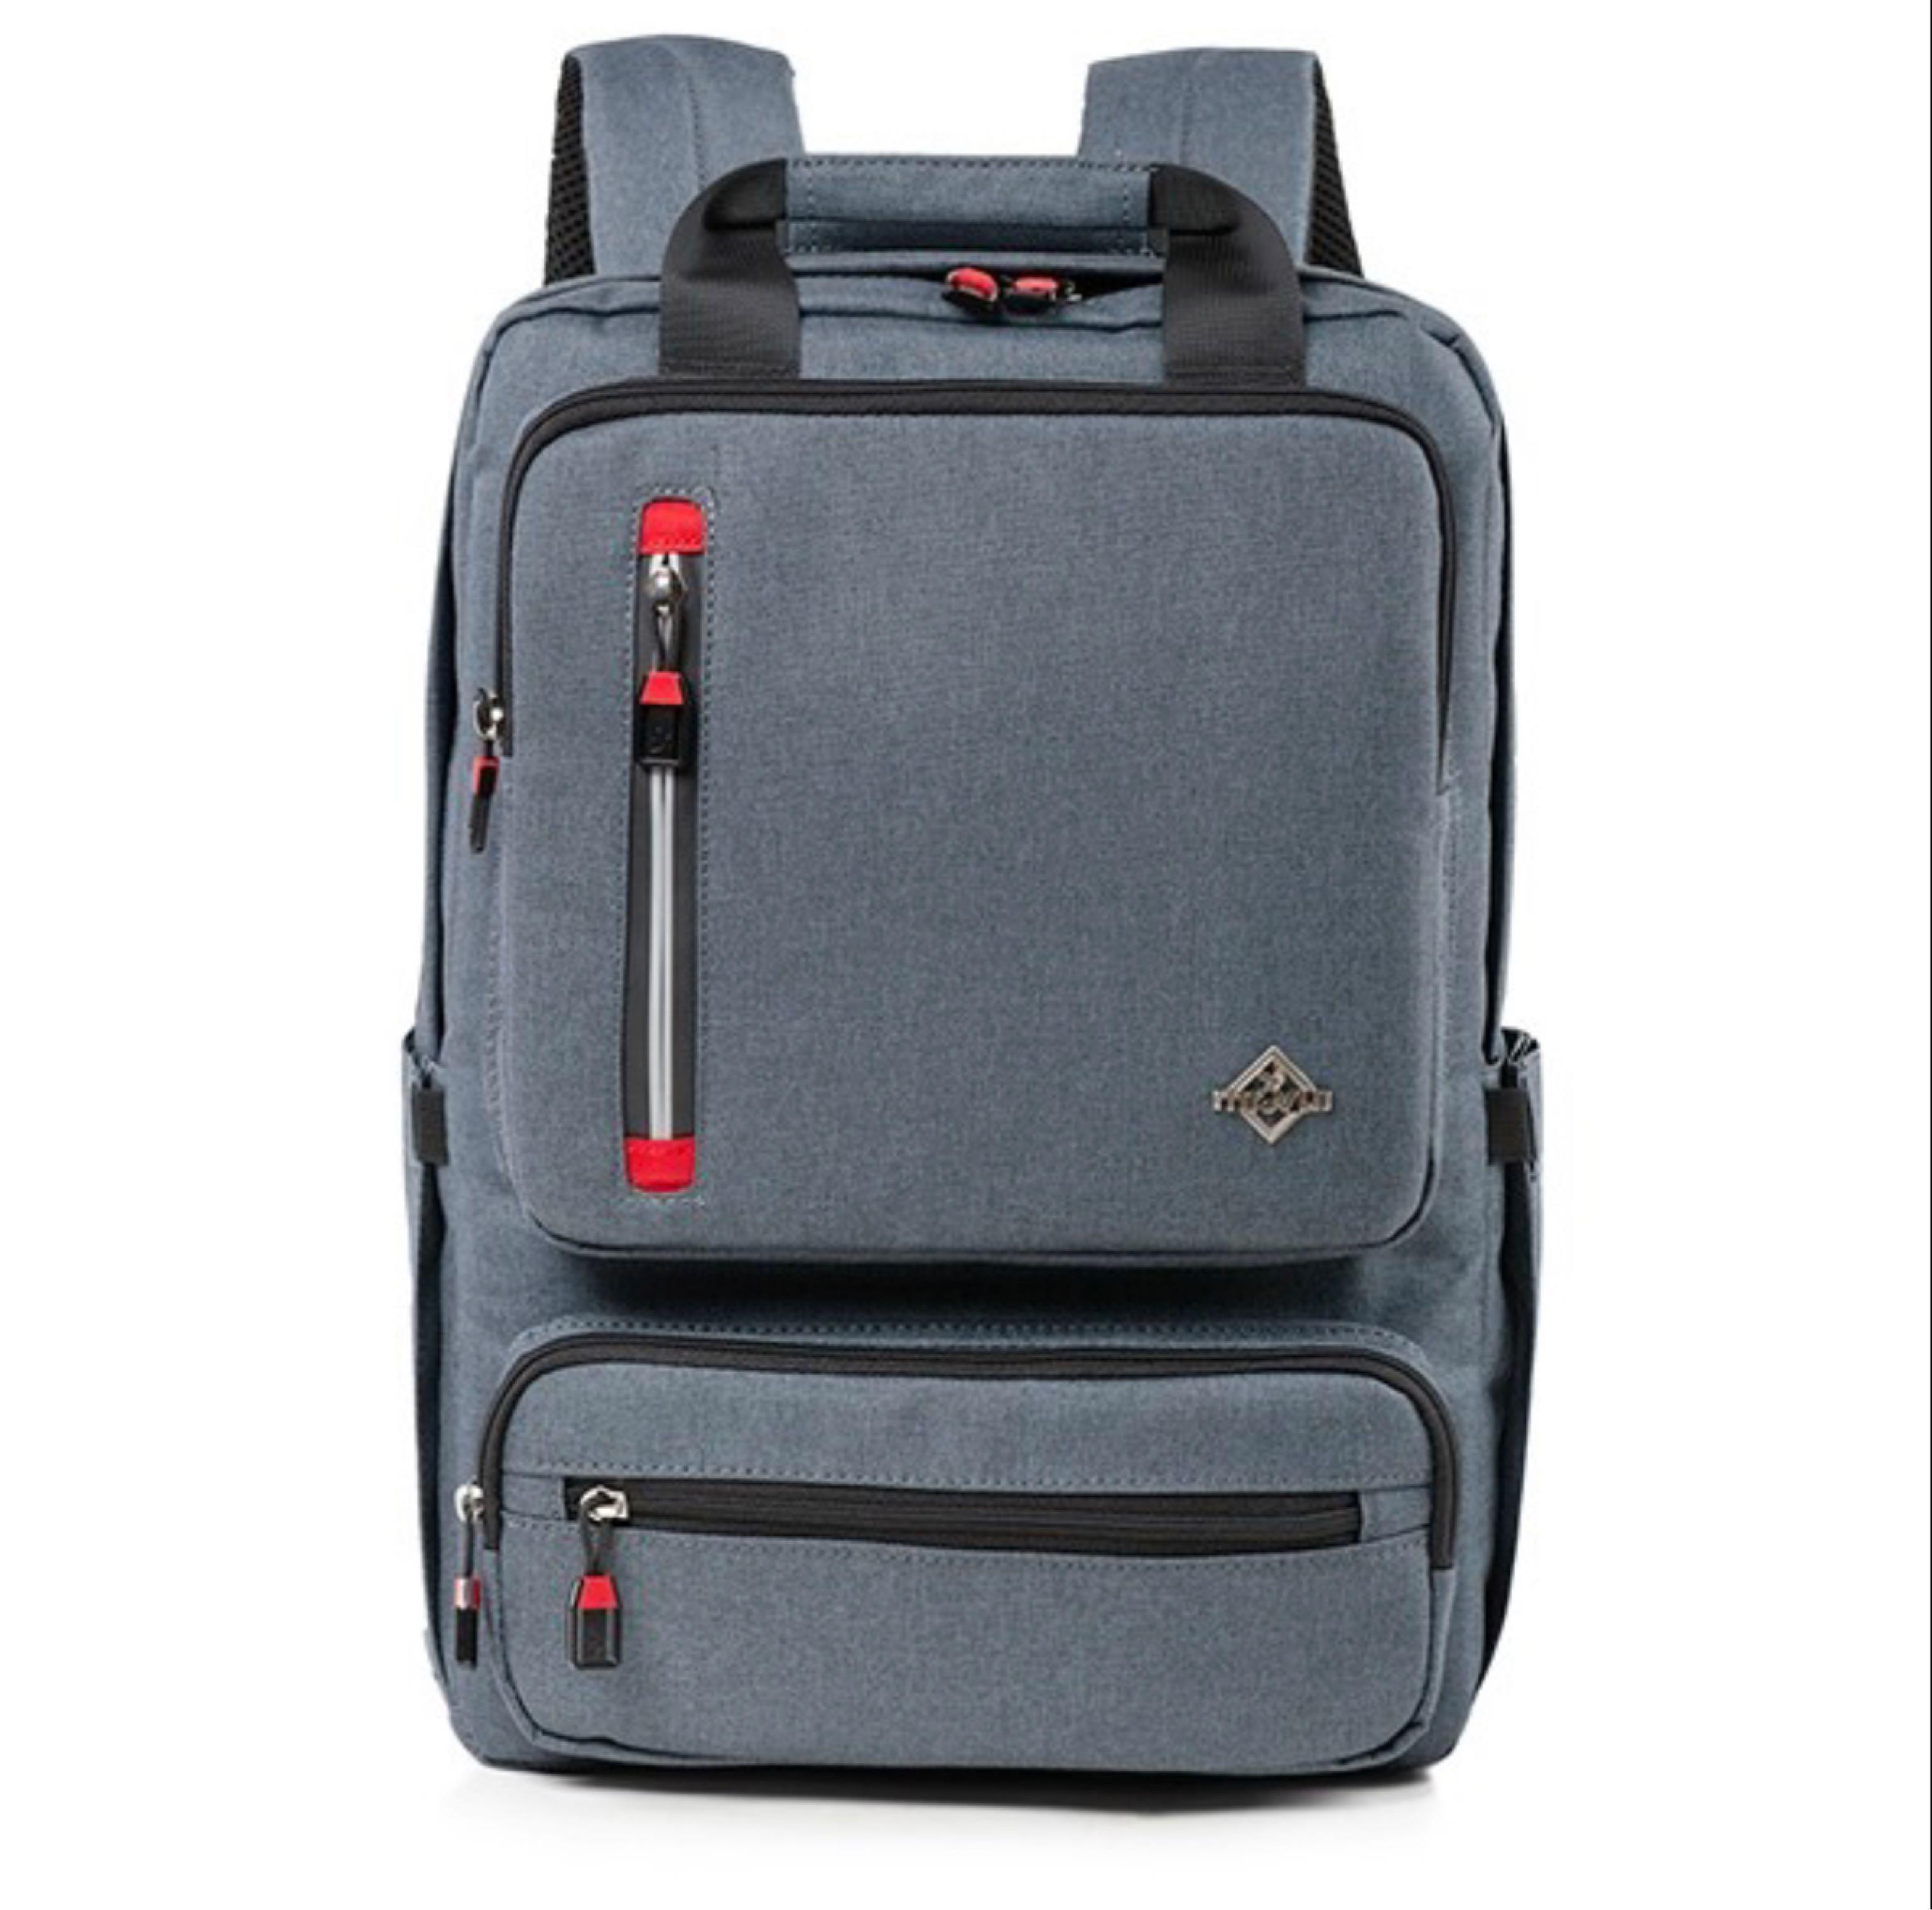 Ba Lô Laptop Mr. Vui BLLT806-15 - nhiều màu